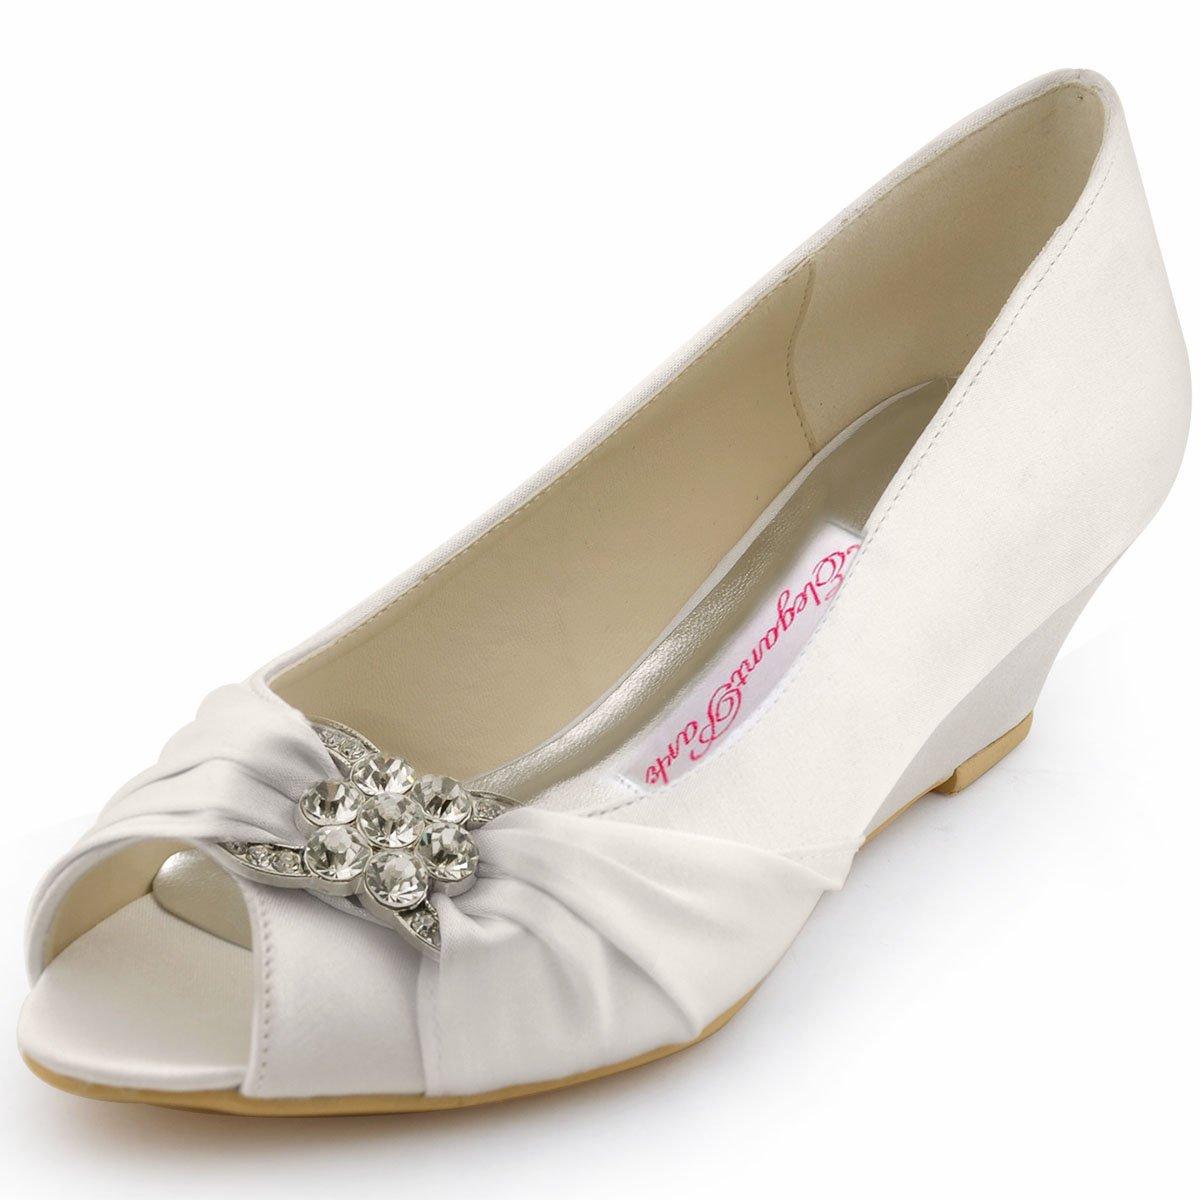 ElegantPark WP1403 Women Peep Toe Pumps Rhinestones Mid Heel Wedges Satin Wedding Bridal Shoes Ivory US 9